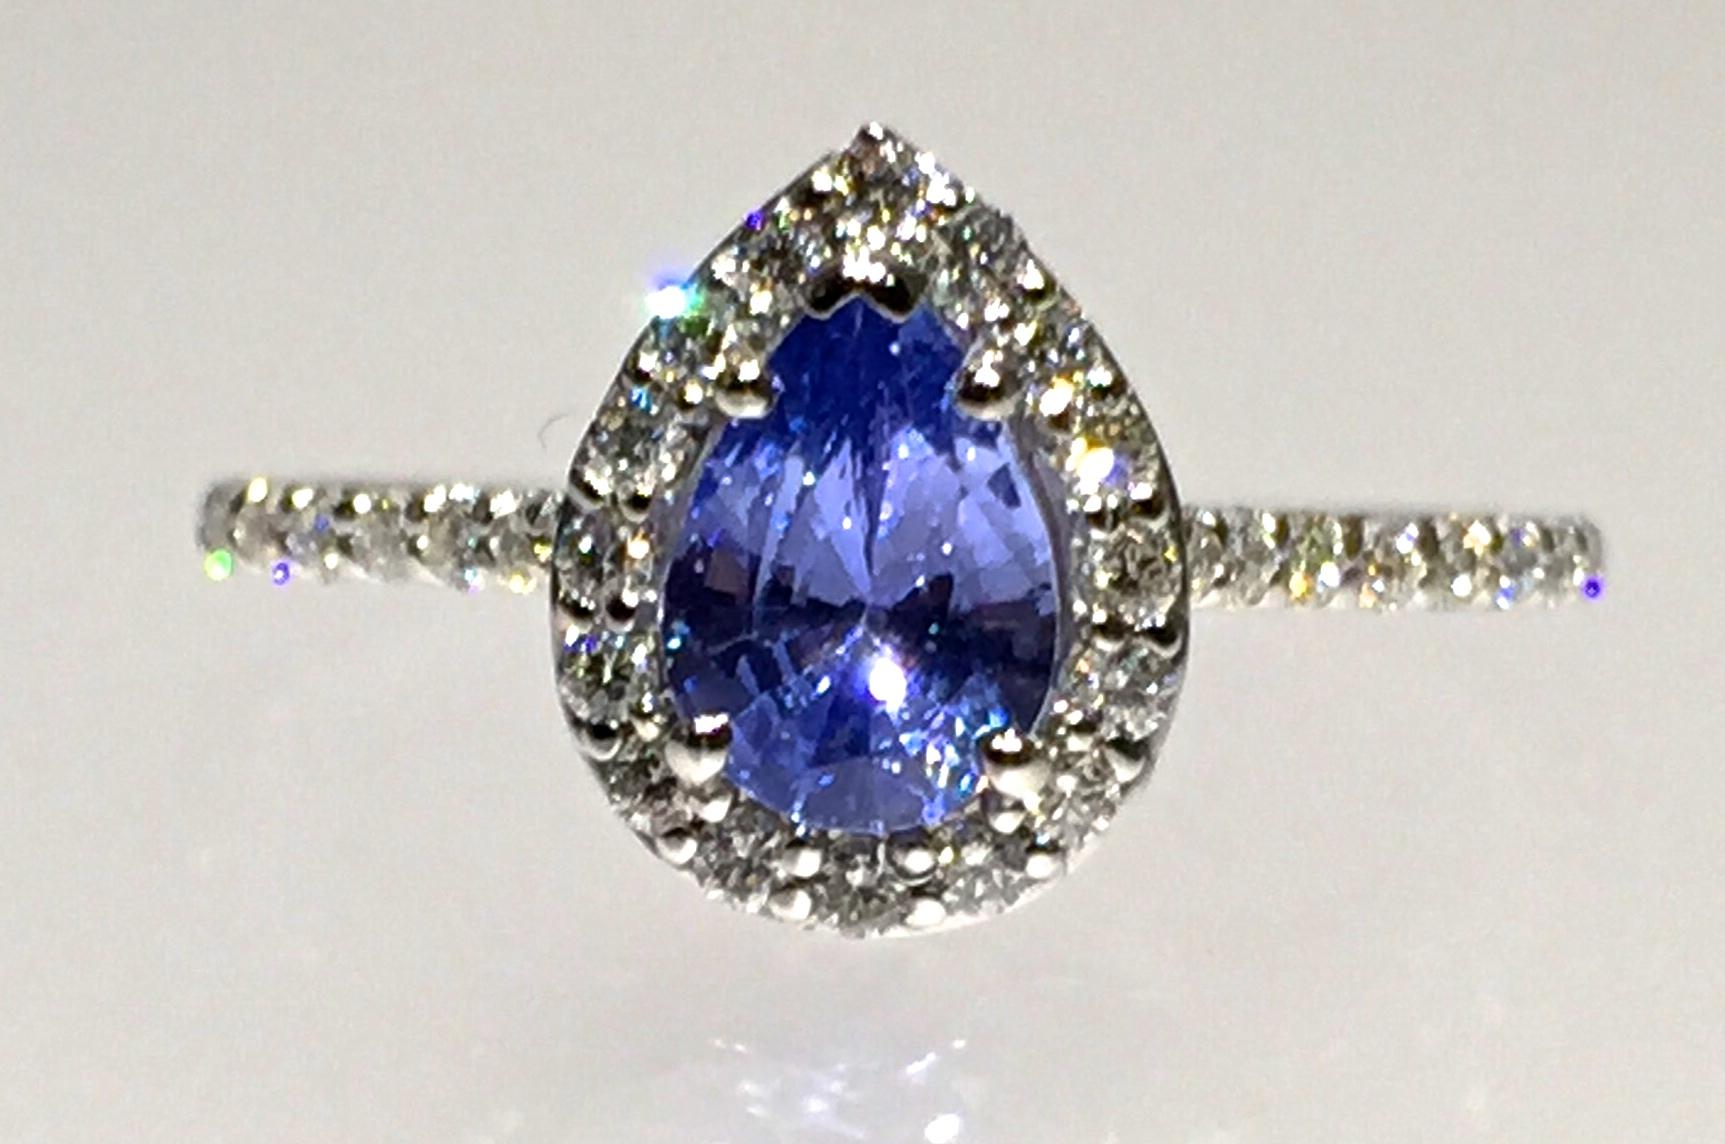 unique-tanzanite-pear-shape-delicate-halo-alternative-engagement-ring-craft-revival-jewelry-store-grand-rapids